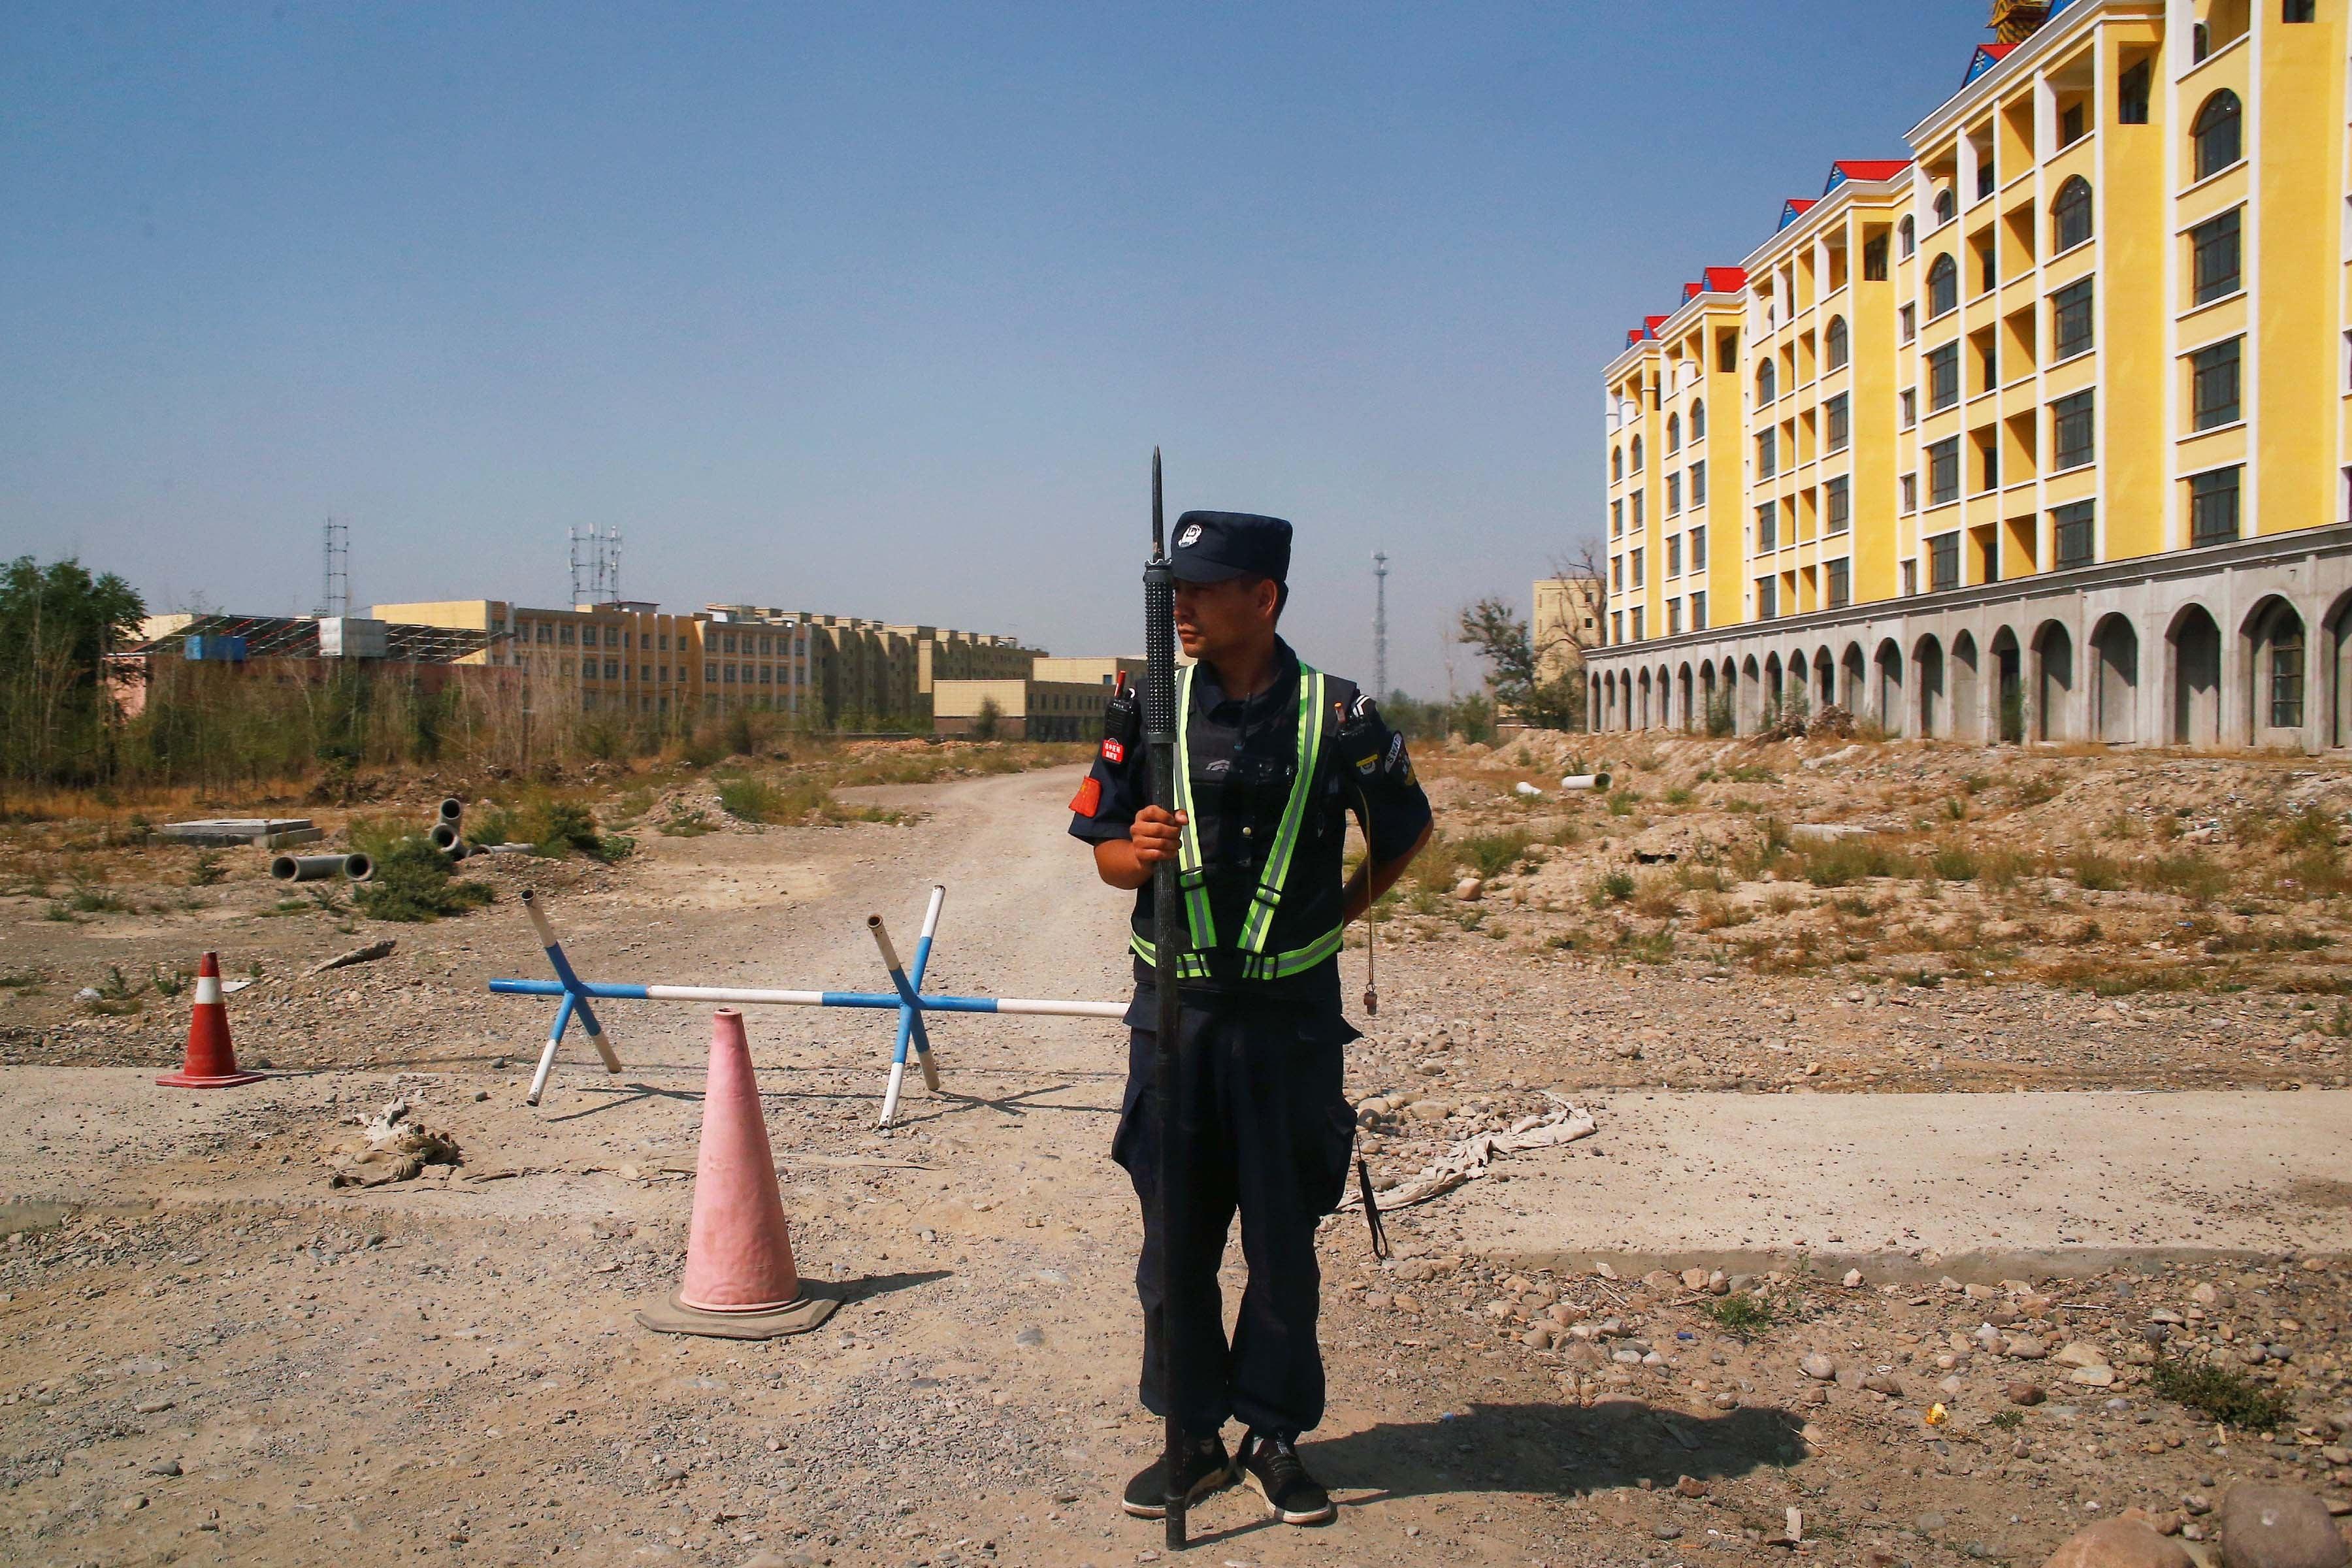 Chine : Crimes contre l'humanité au Xinjiang